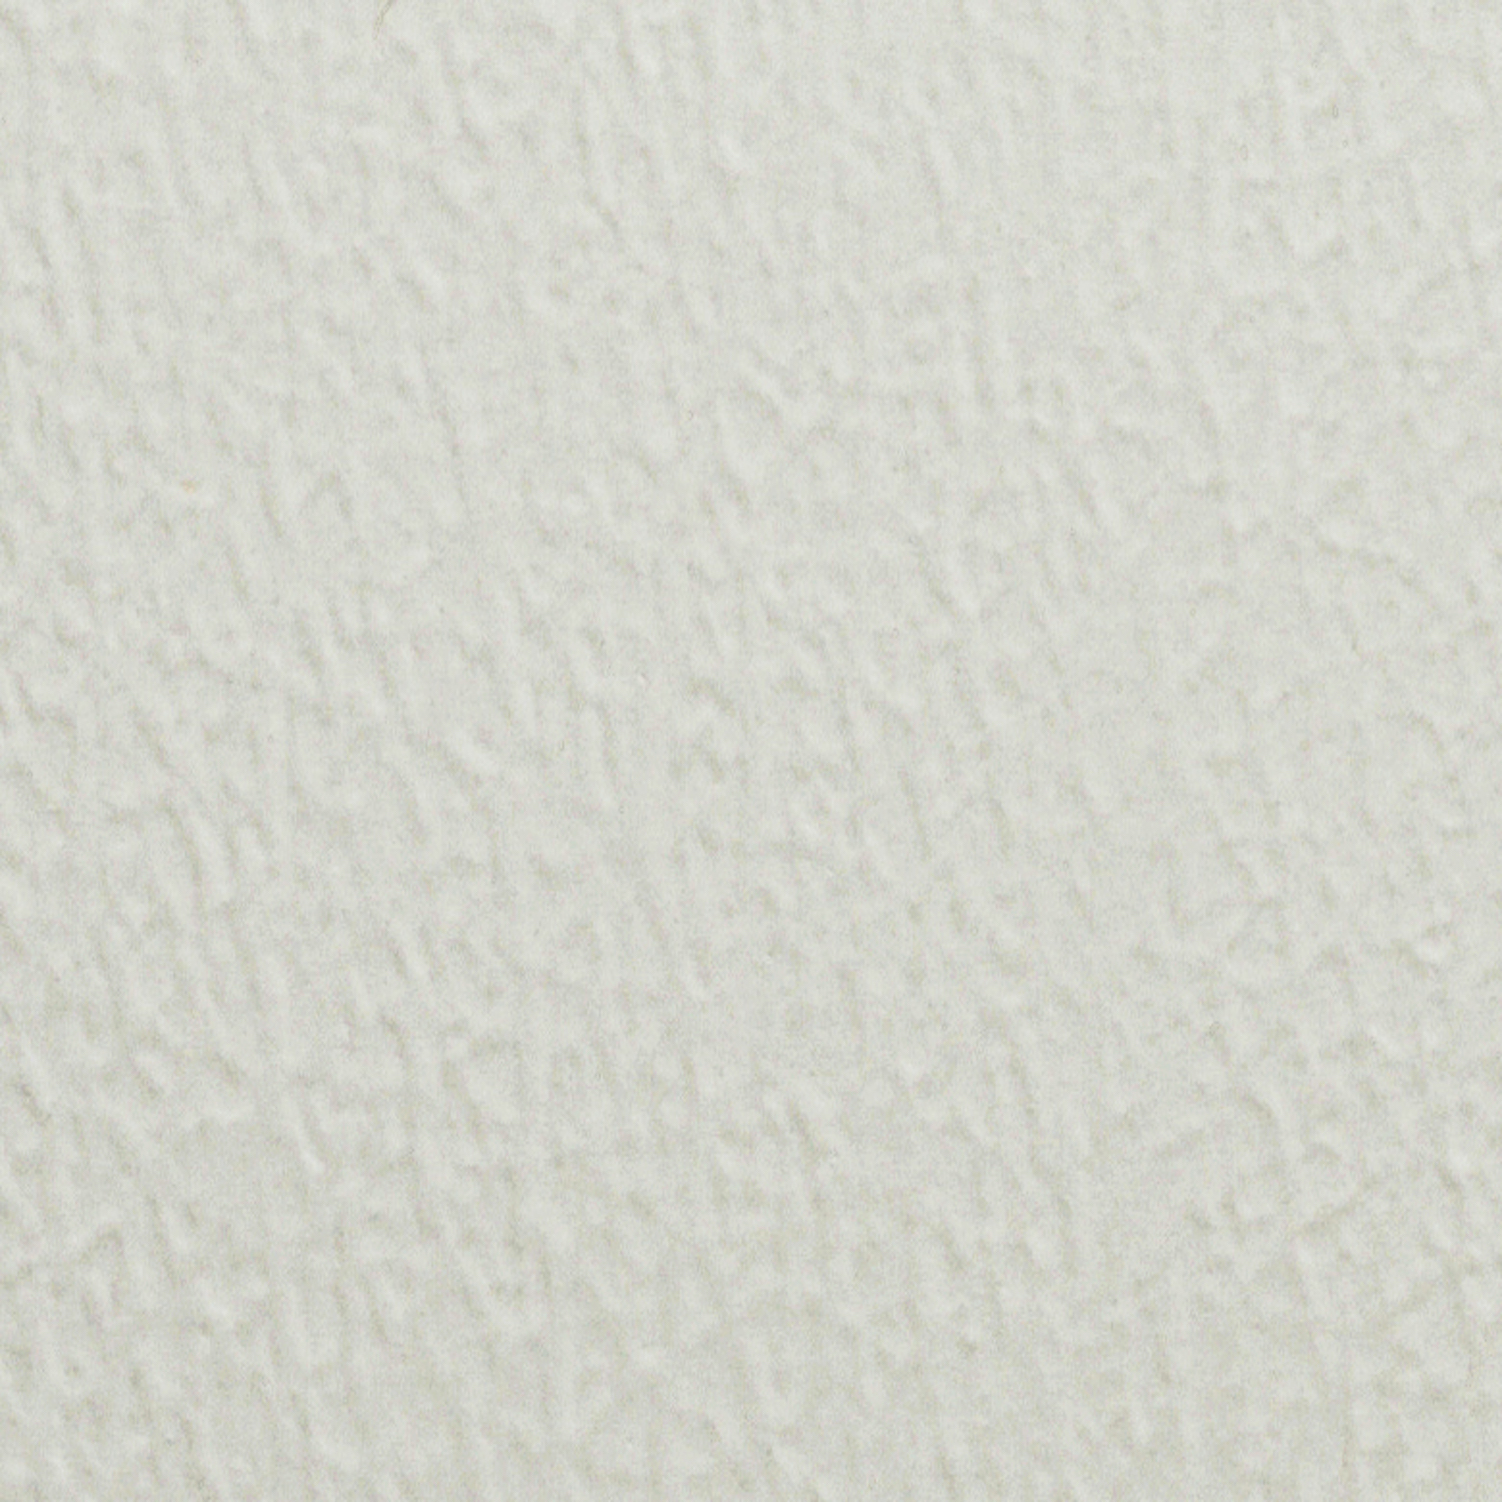 BRIGHT WHITE   XL-2085